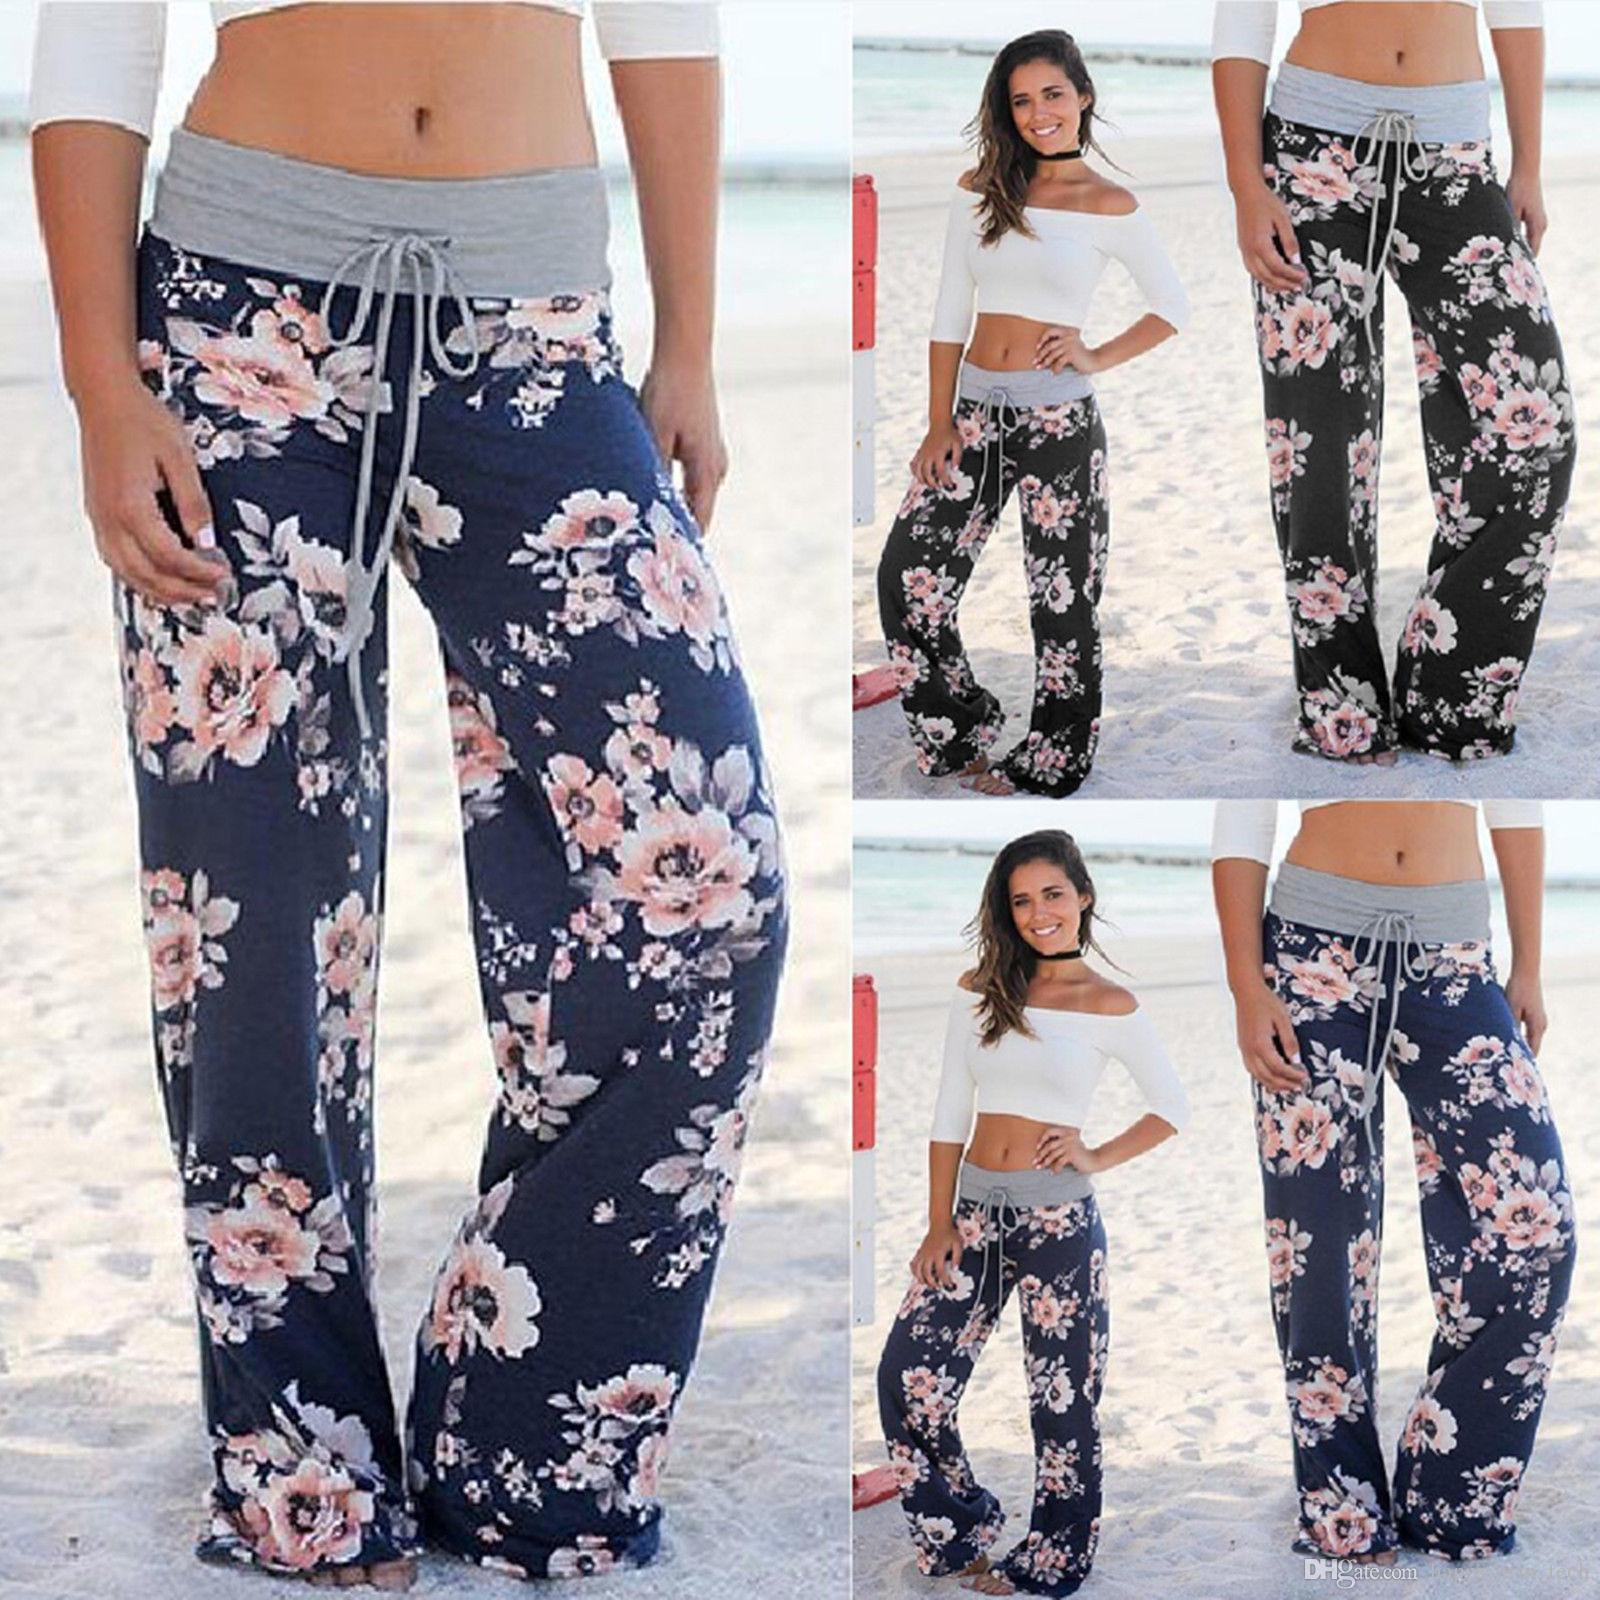 95f8cef0ff18 2019 Summer Lady Bohemian Floral Pants High Waist Wide Leg Trousers Loose  Pants Gray Black Blue Plus Size S XXXL 0486 From Happy_win_tech, $21.1 |  DHgate.